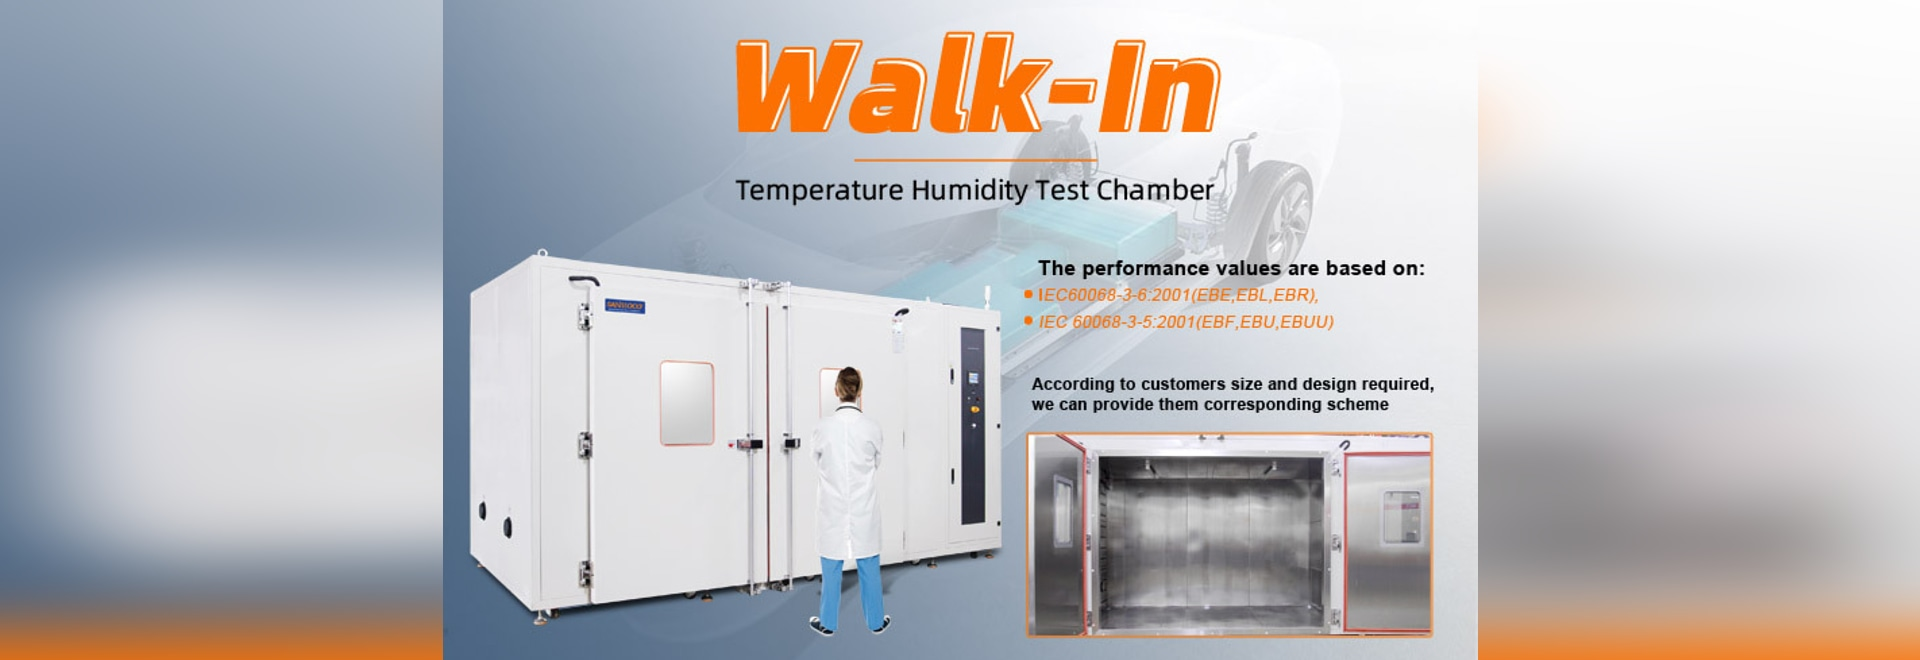 Chambre d'essai de température standard/custom walk-in type Sanwood